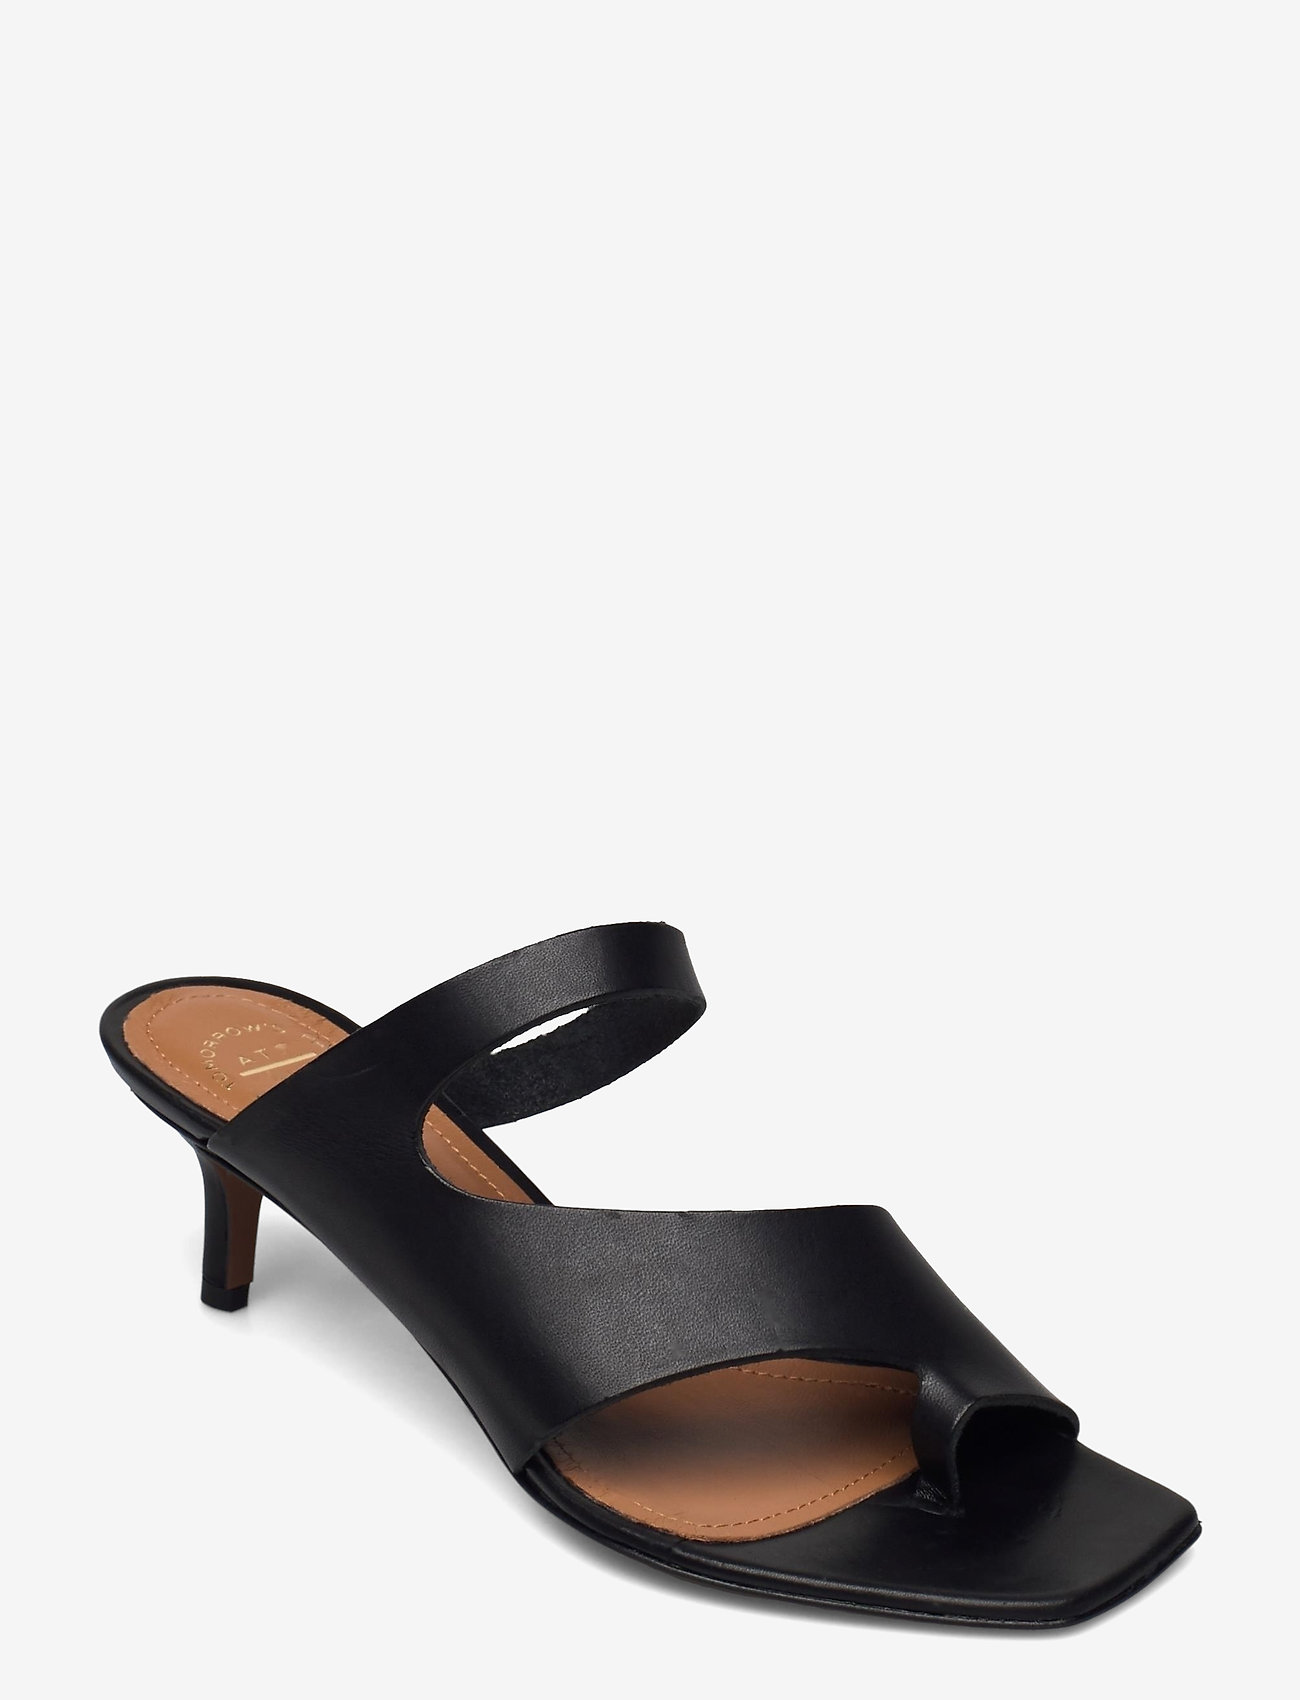 ATP Atelier - Pittuini Black Vacchetta - högklackade sandaler - black - 0